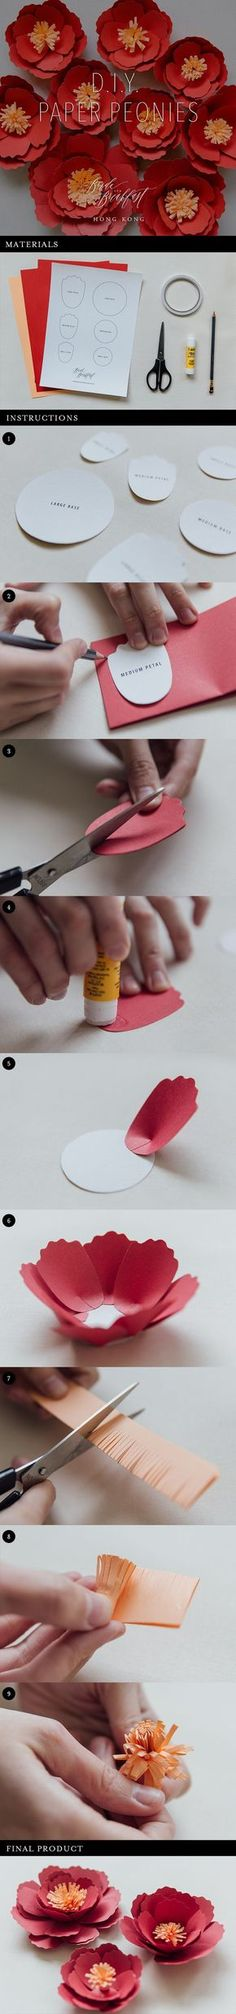 DIY Paper Peonies   Paper Craft   Paper Flowers   Wedding Decor   Free Printable Template